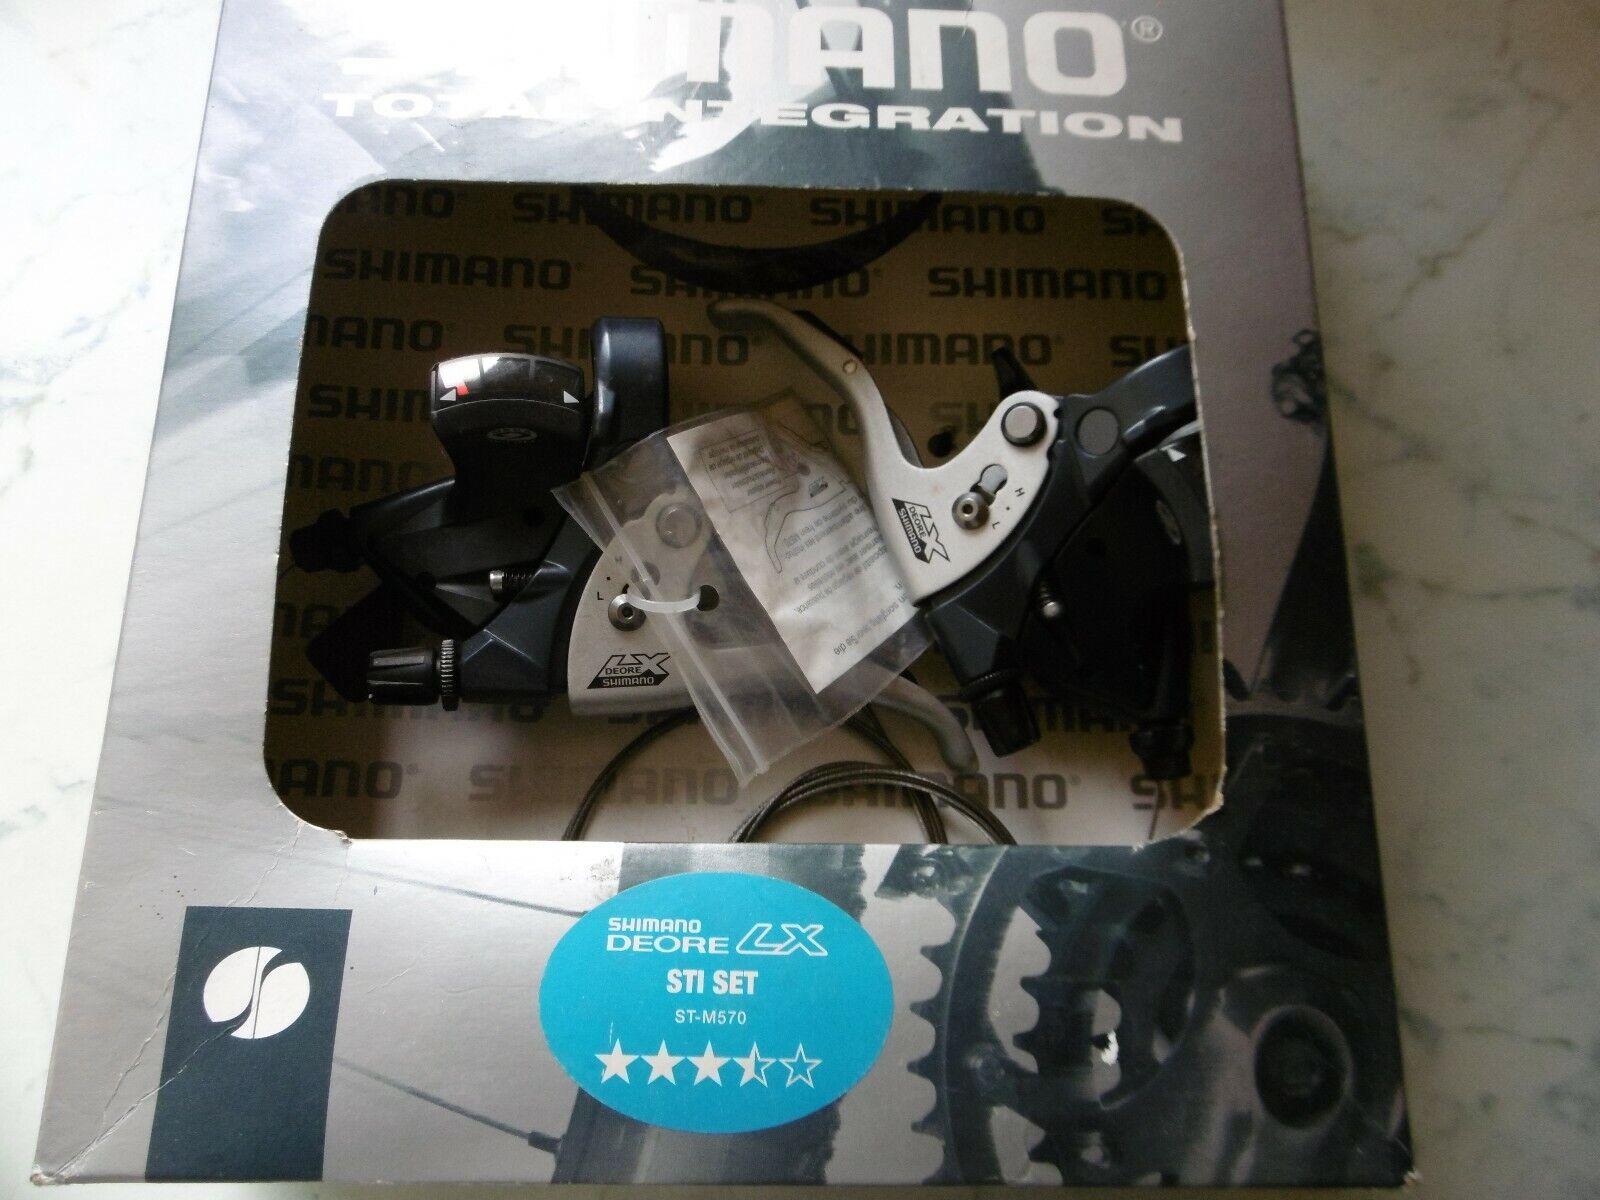 Shimano Deore LX ST-M570 3X9 Sp Shifter STI Set NOS